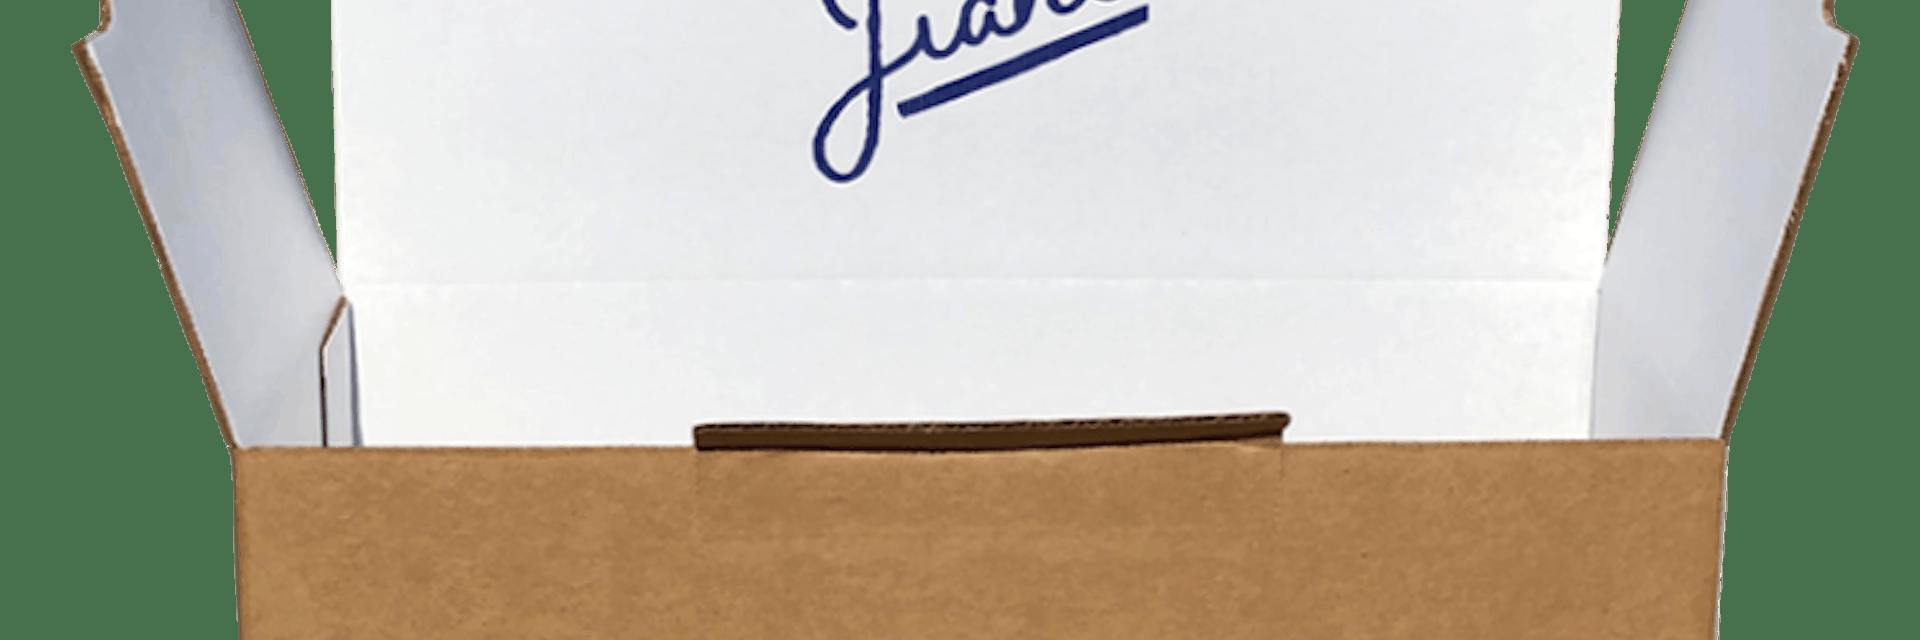 boxes-for-shipping-kombucha-seltzer